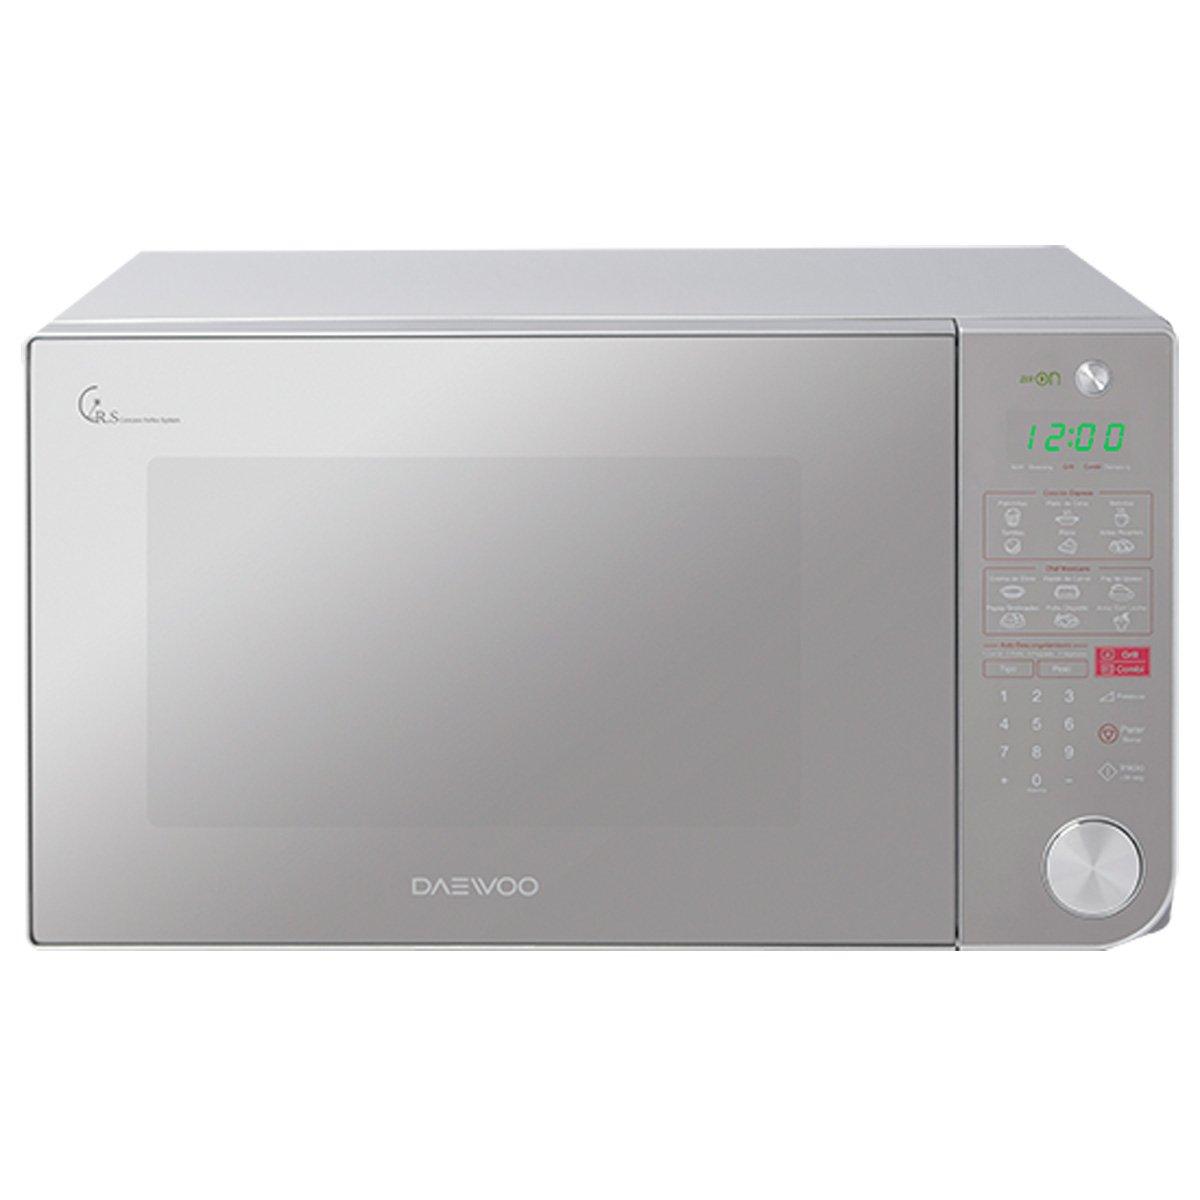 Horno de microondas y dorador daewoo 1 1 pies silver for Cocinar en microondas